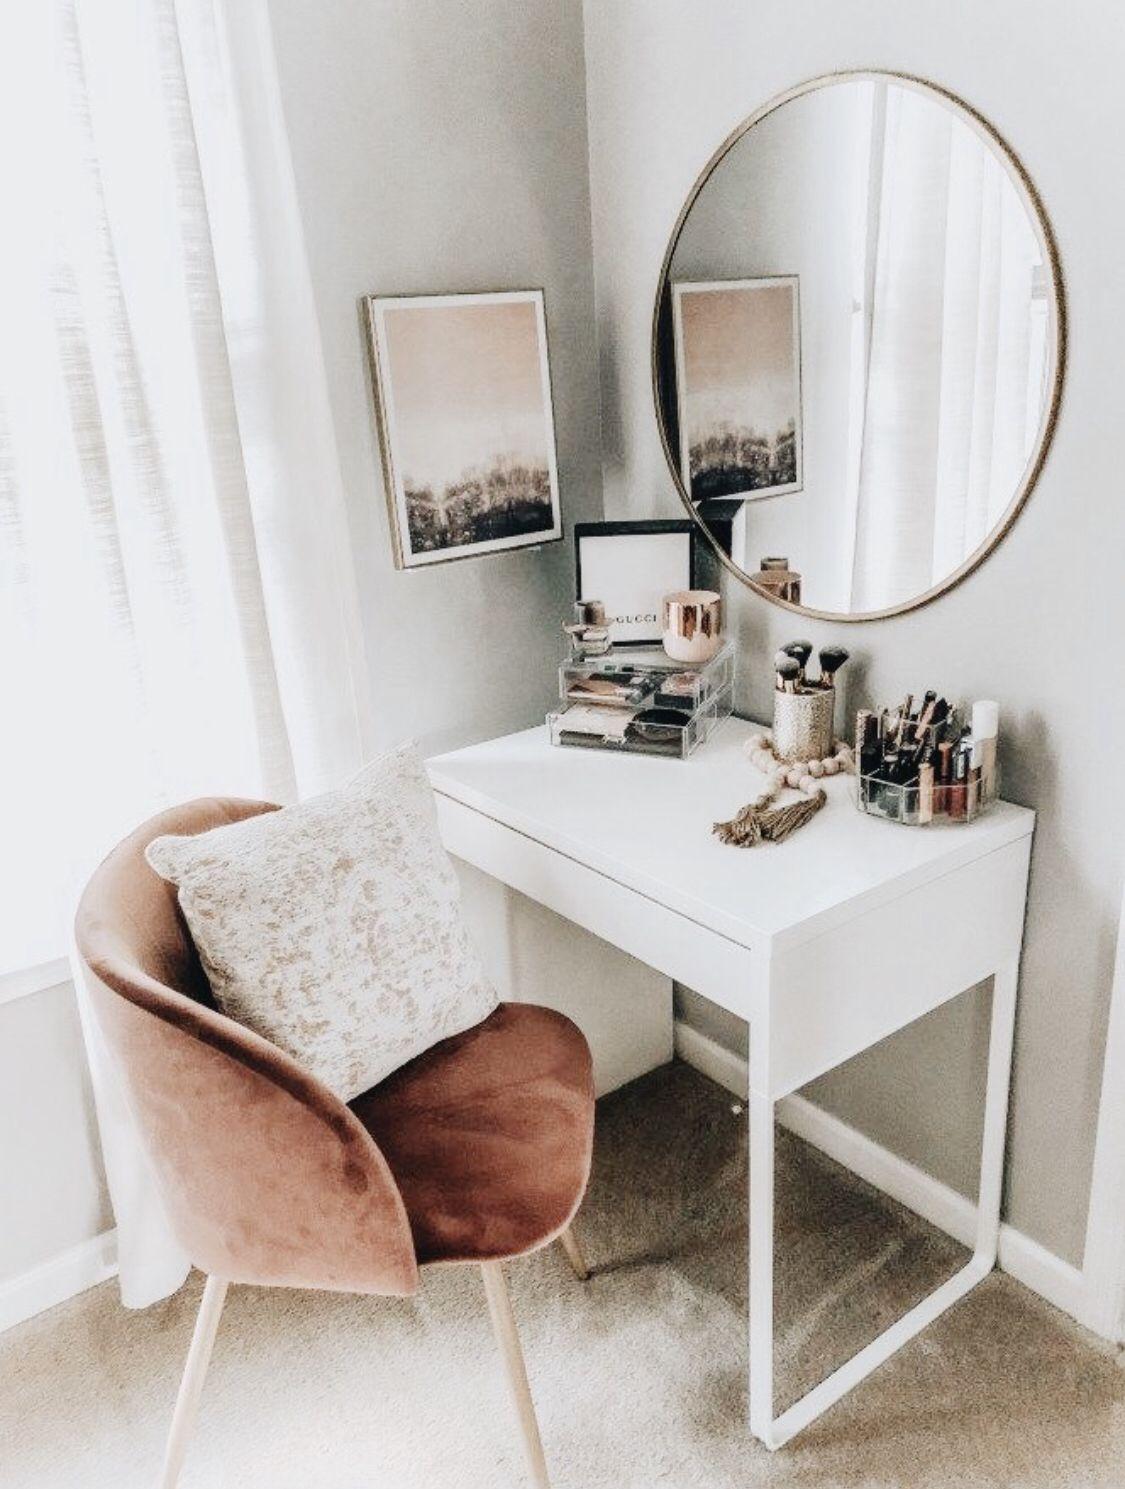 Cute Desk For Makeup In All The Right Colors Homedecor Modern Decor House Interior Design Modern Decor Ins In 2020 Bedroom Design Stylish Bedroom Bedroom Makeover